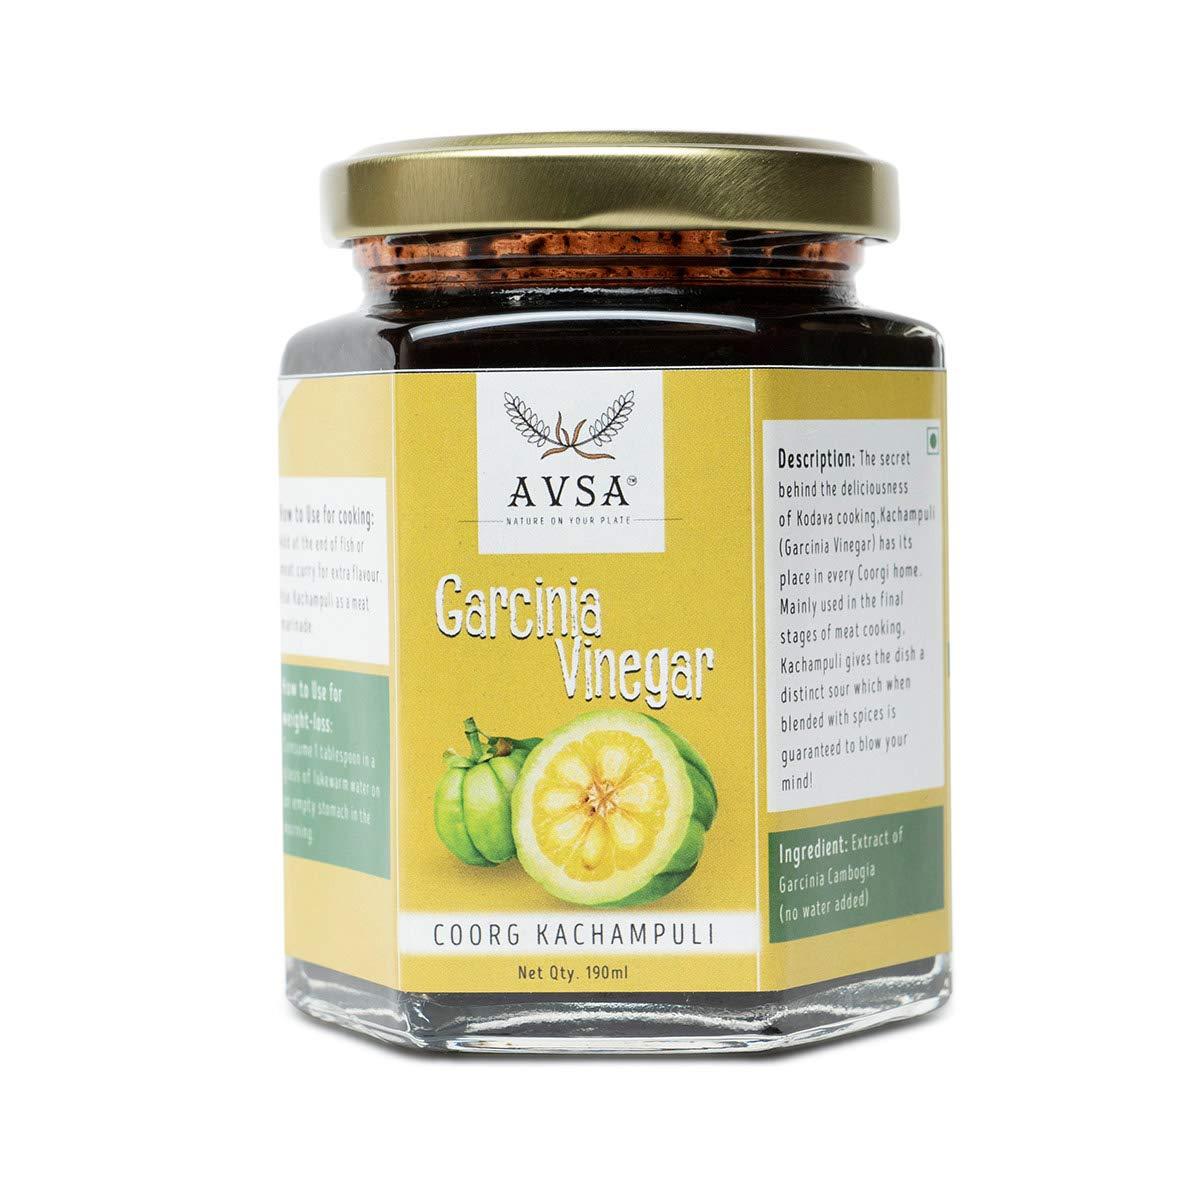 Avsa Garcinia Vinegar (Coorg Kachampuli) - 190 ml Kachampuli Vinegar